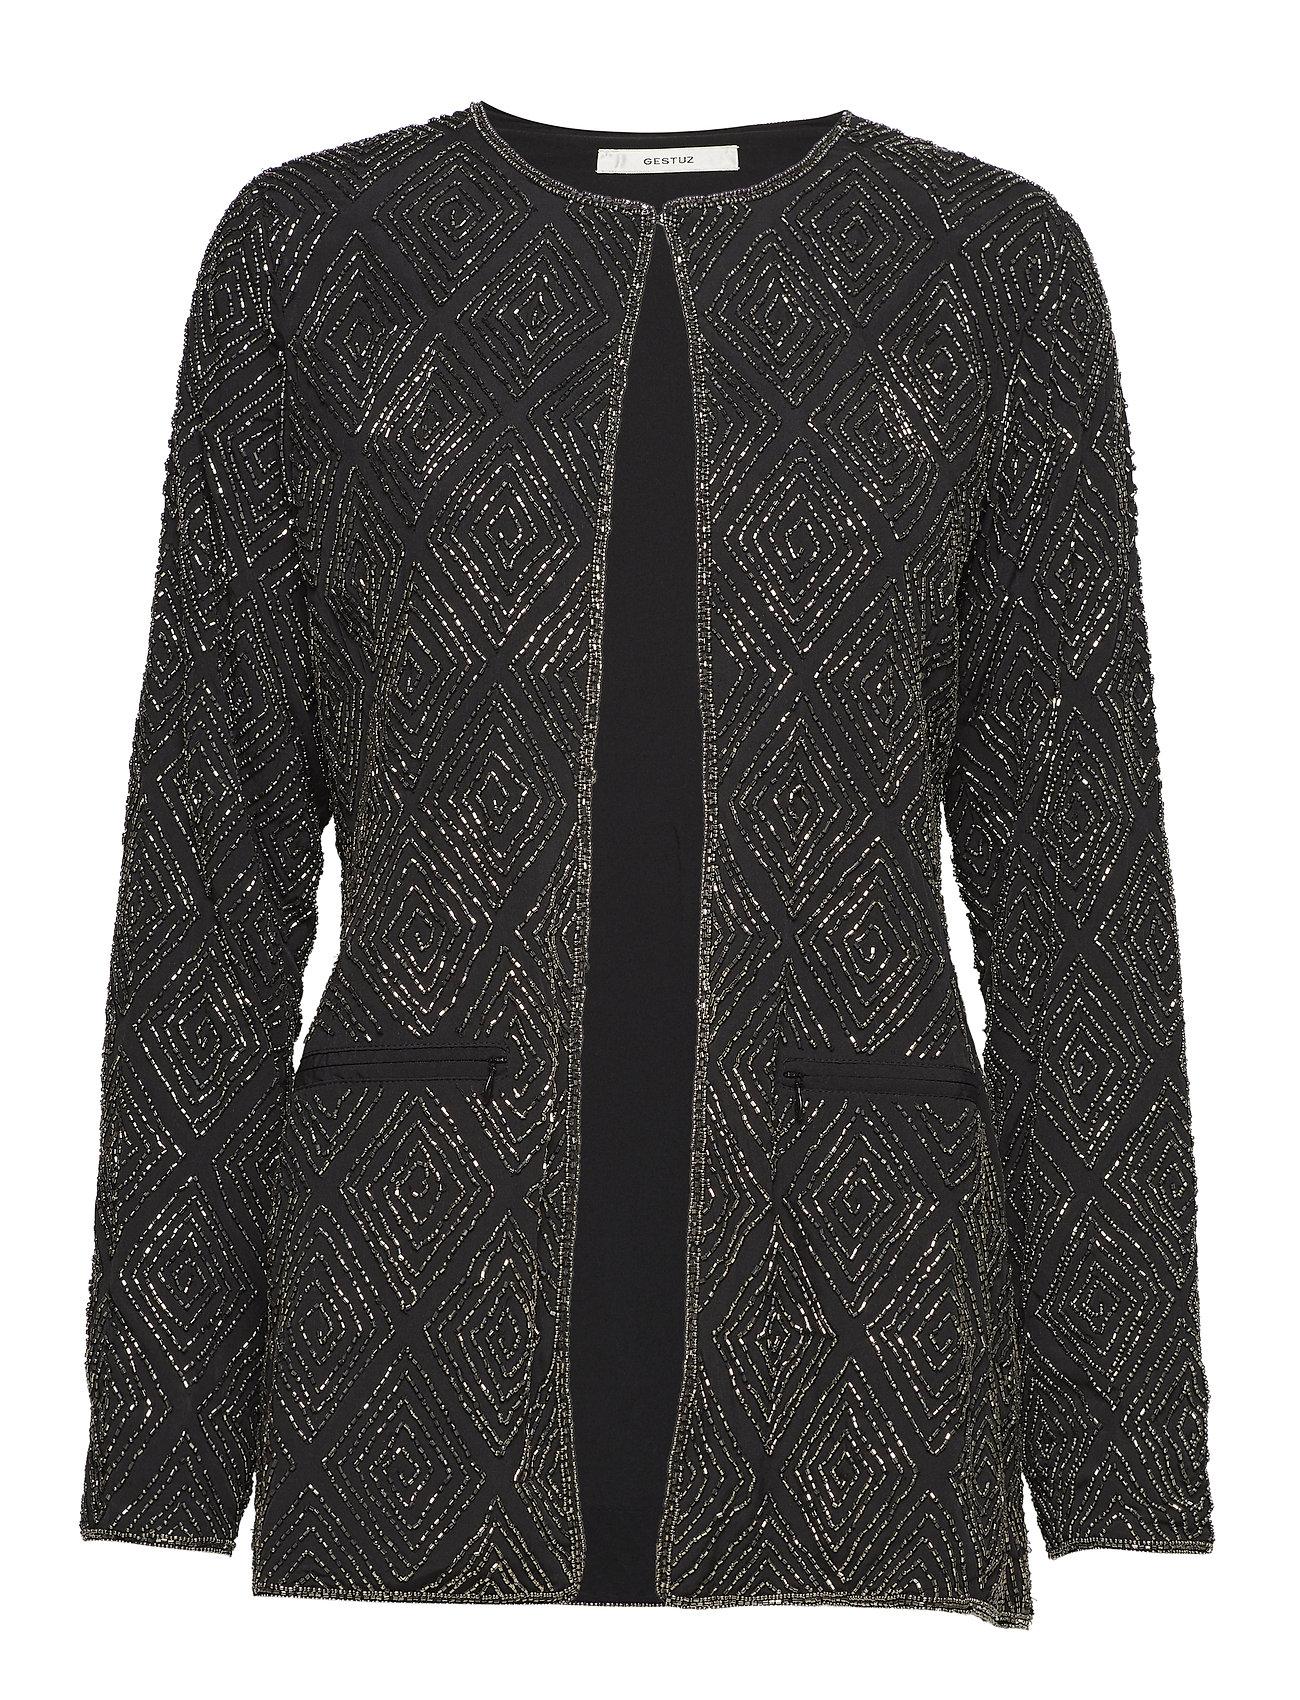 Gestuz Pearla jacket ZE4 18 - BLACK